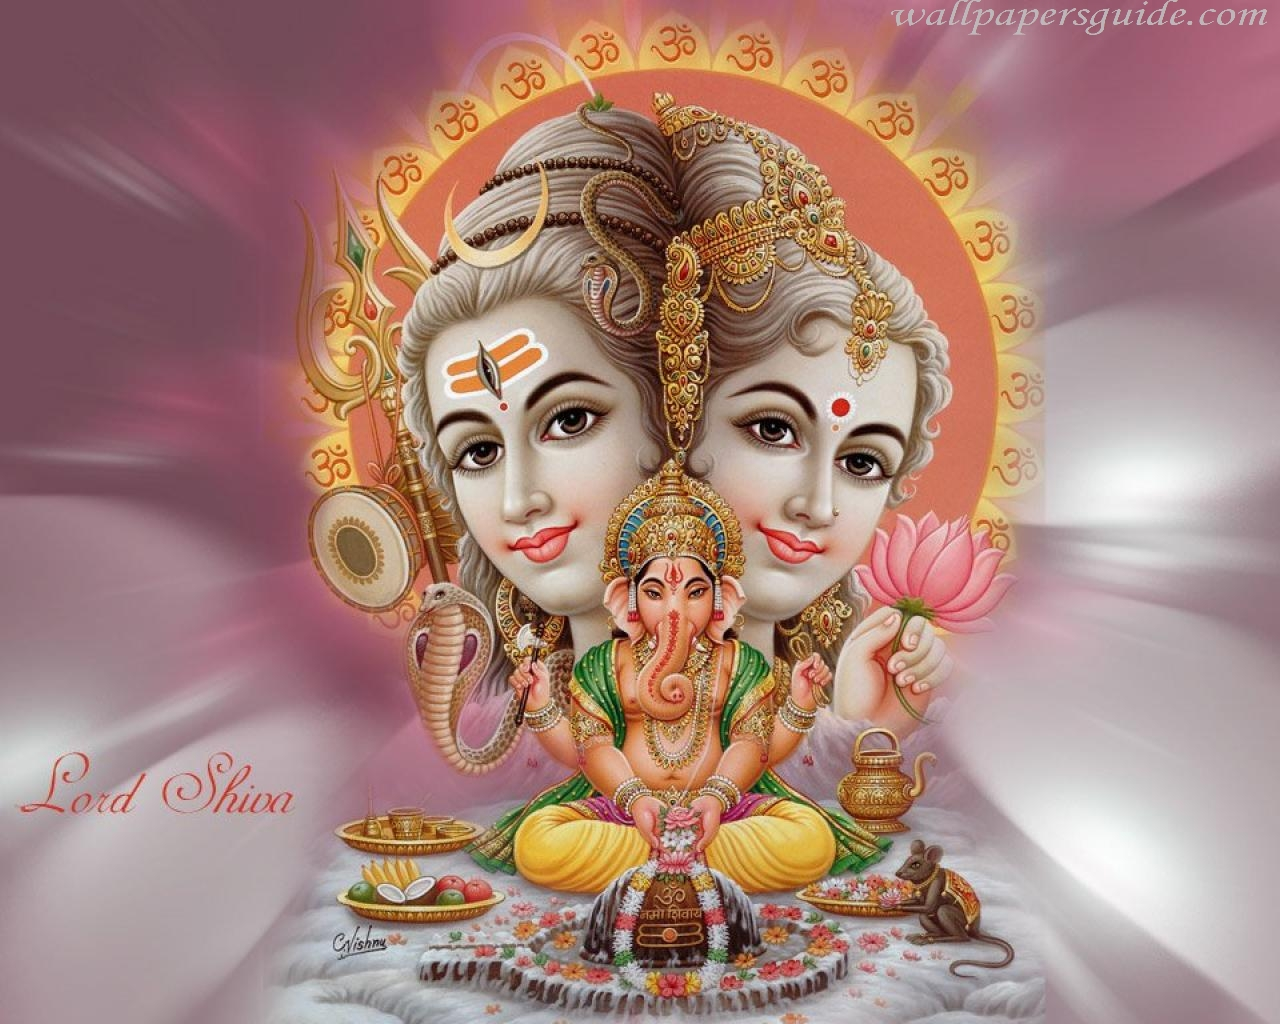 Latest Full HD Quality Desktop Wallpapers Hindu Gods HD Wallpapers 1280x1024